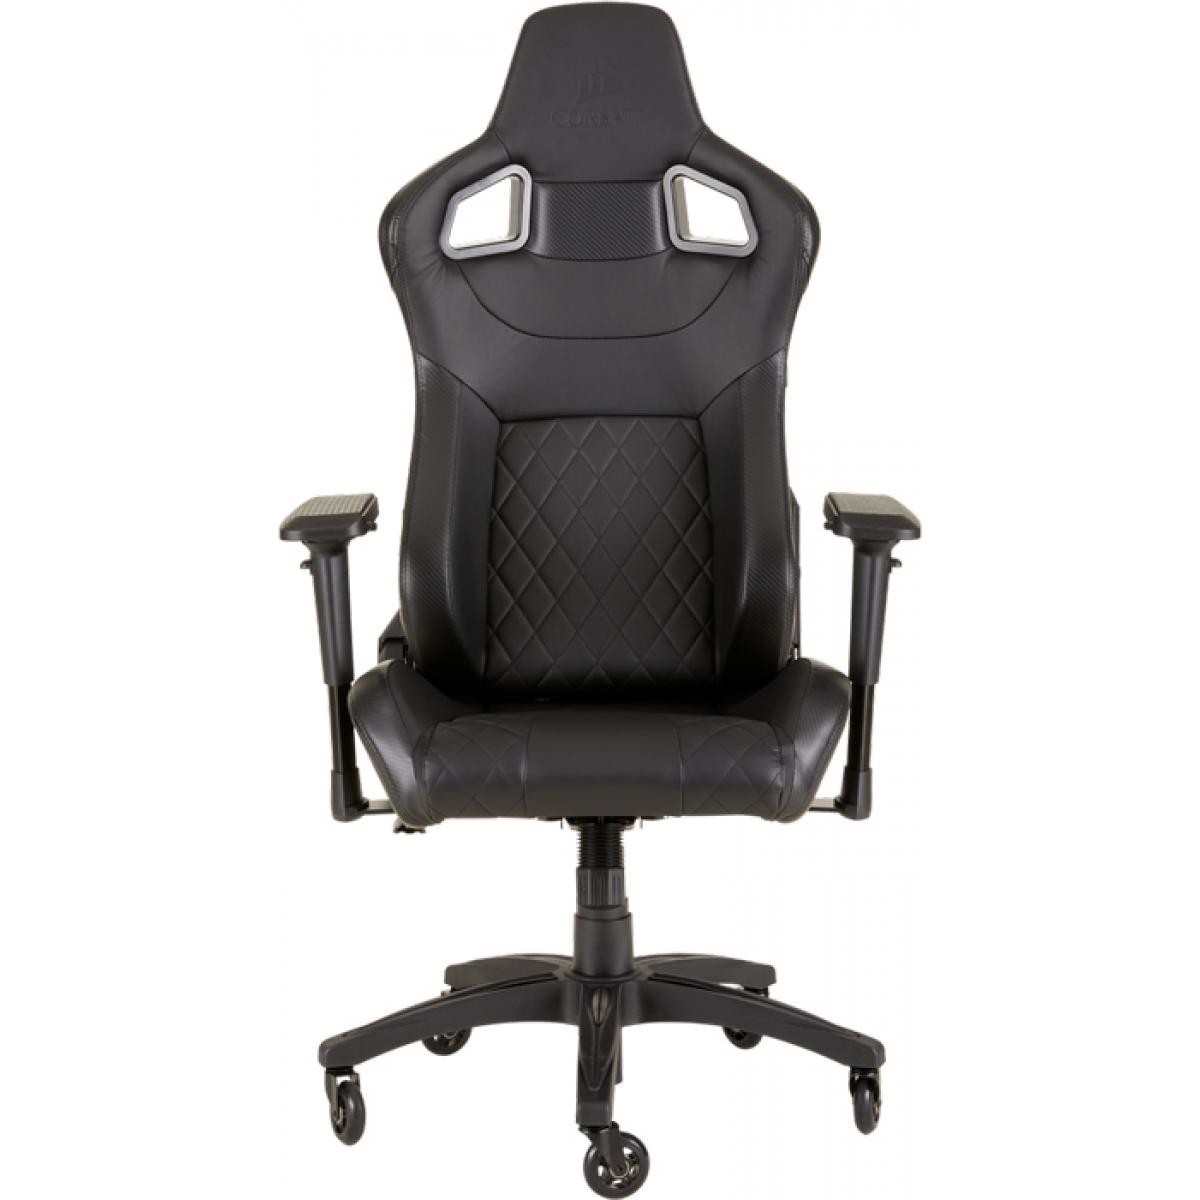 Cadeira Gamer Corsair T1 Race 2018 Edition, Black, CF-9010011-WW